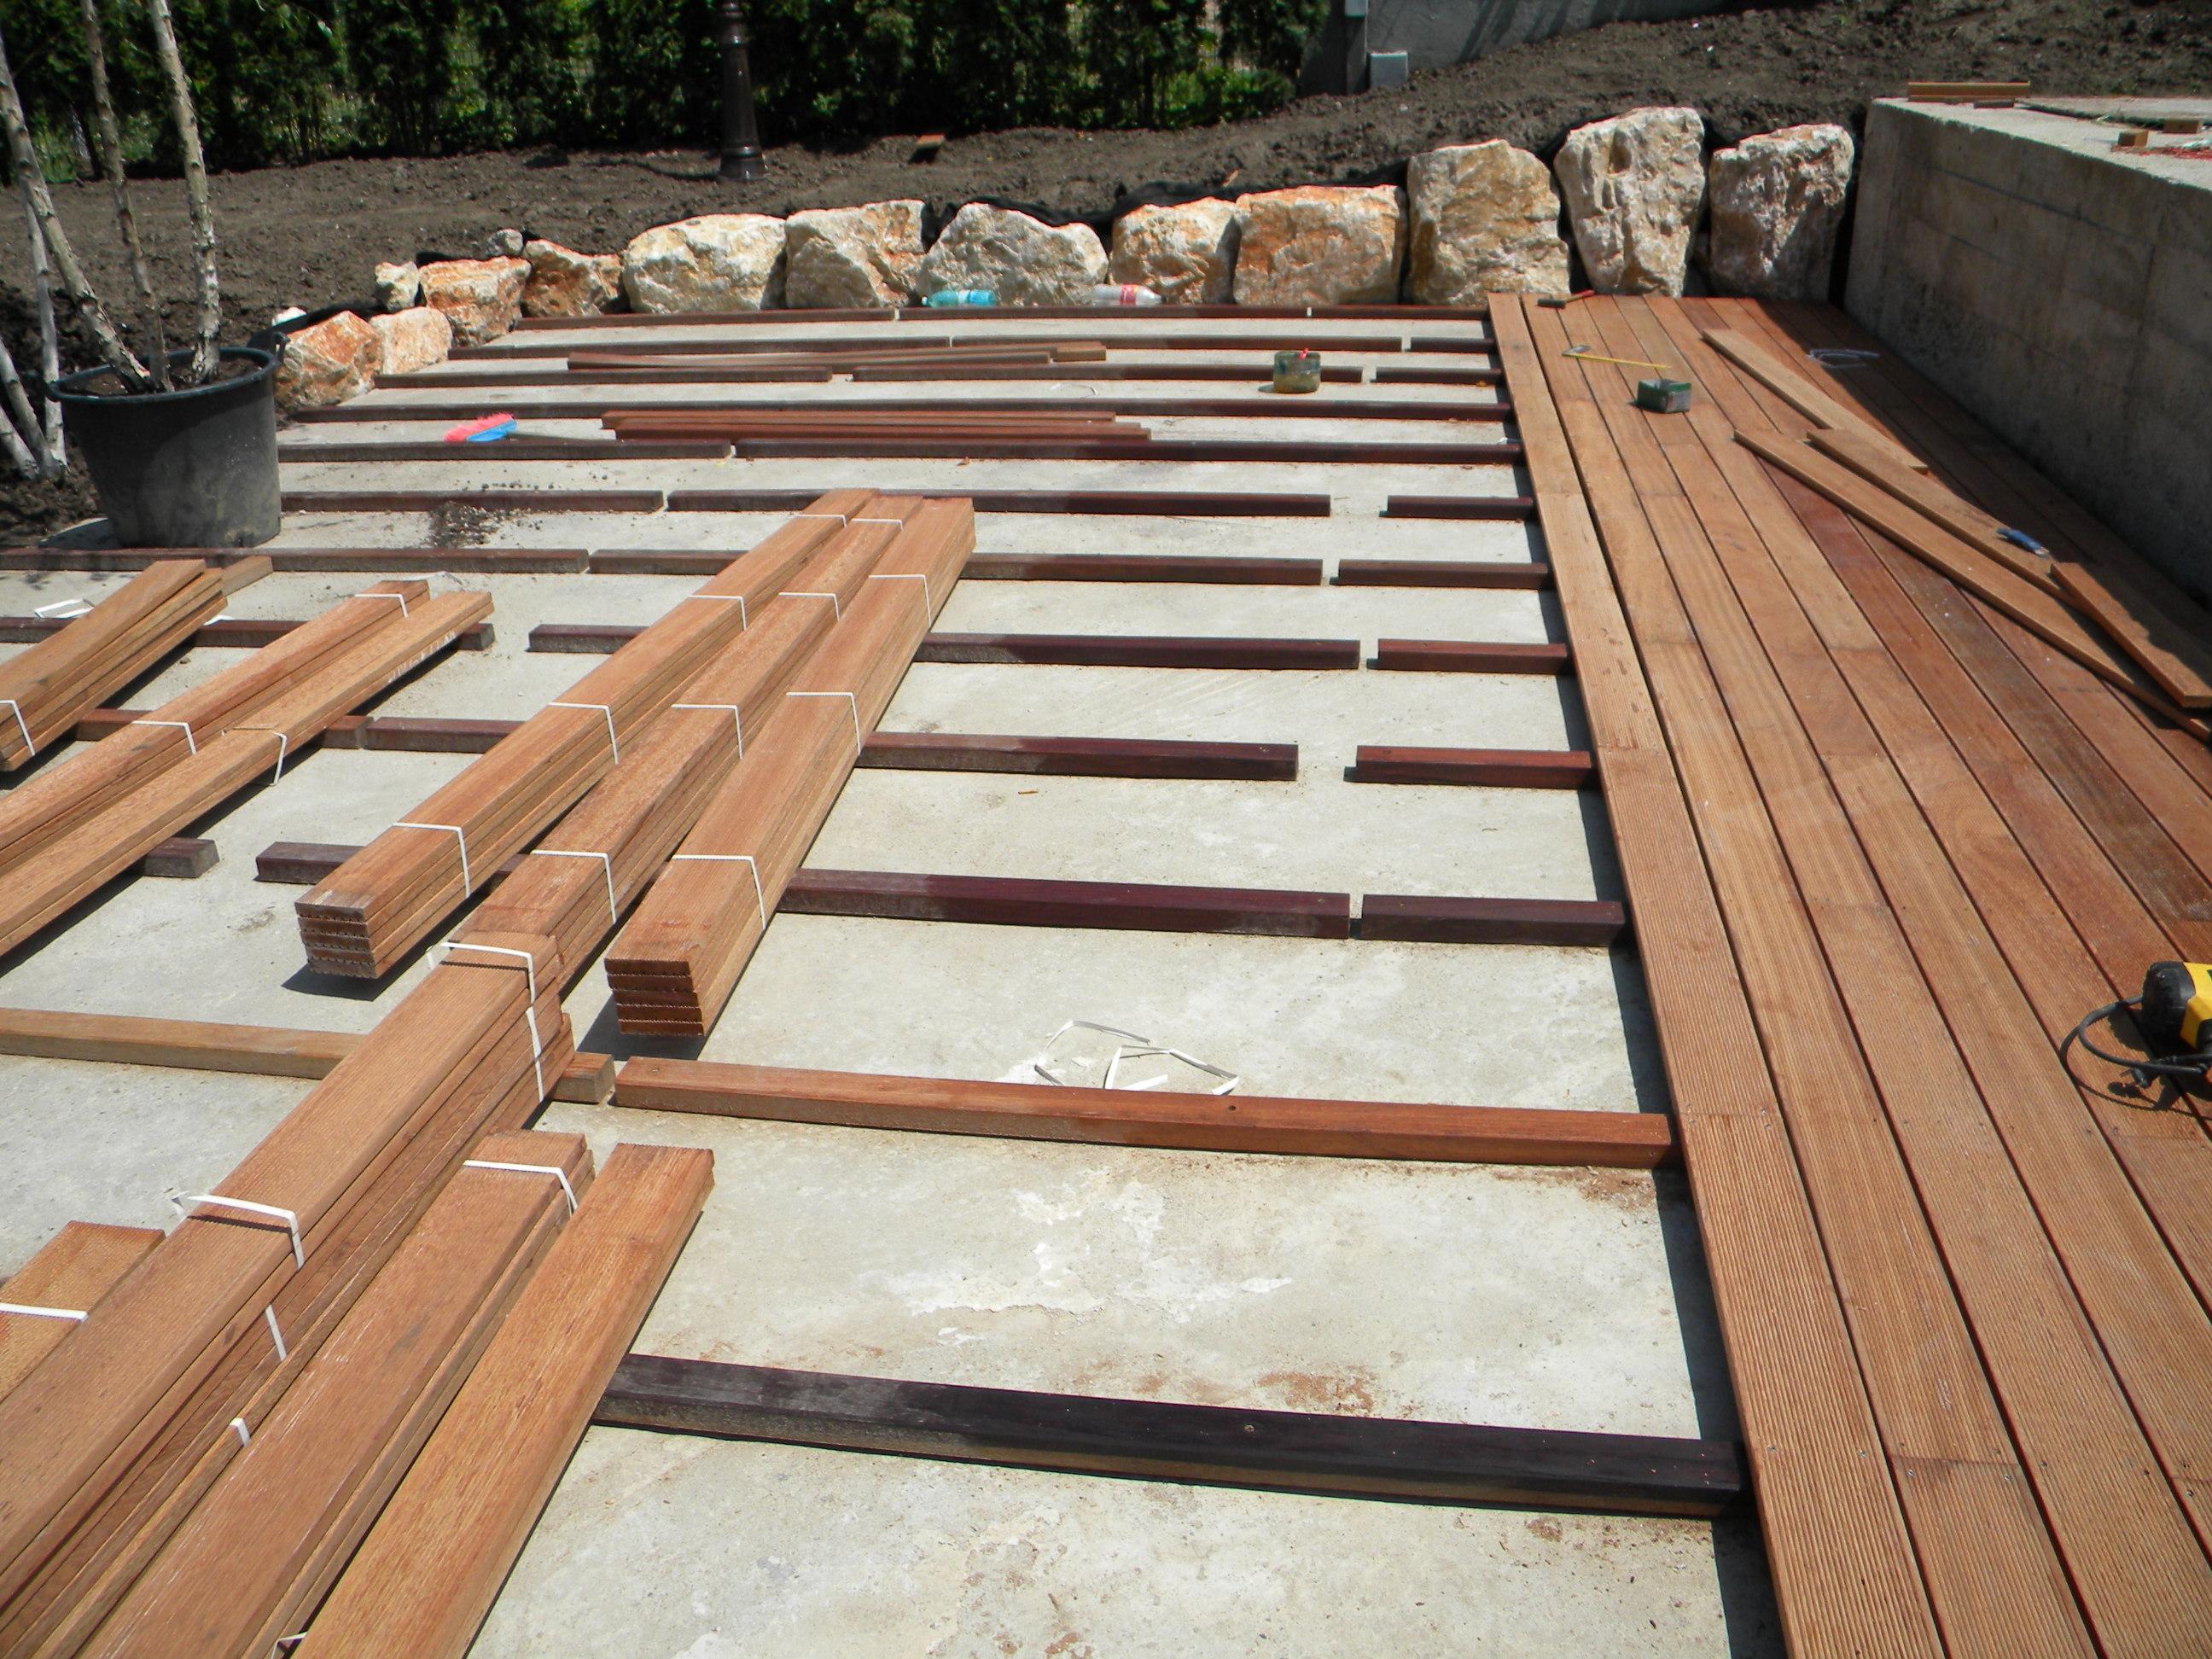 Deck-uri lemn - Angelim Pedra SELVA FLOORS - Poza 41